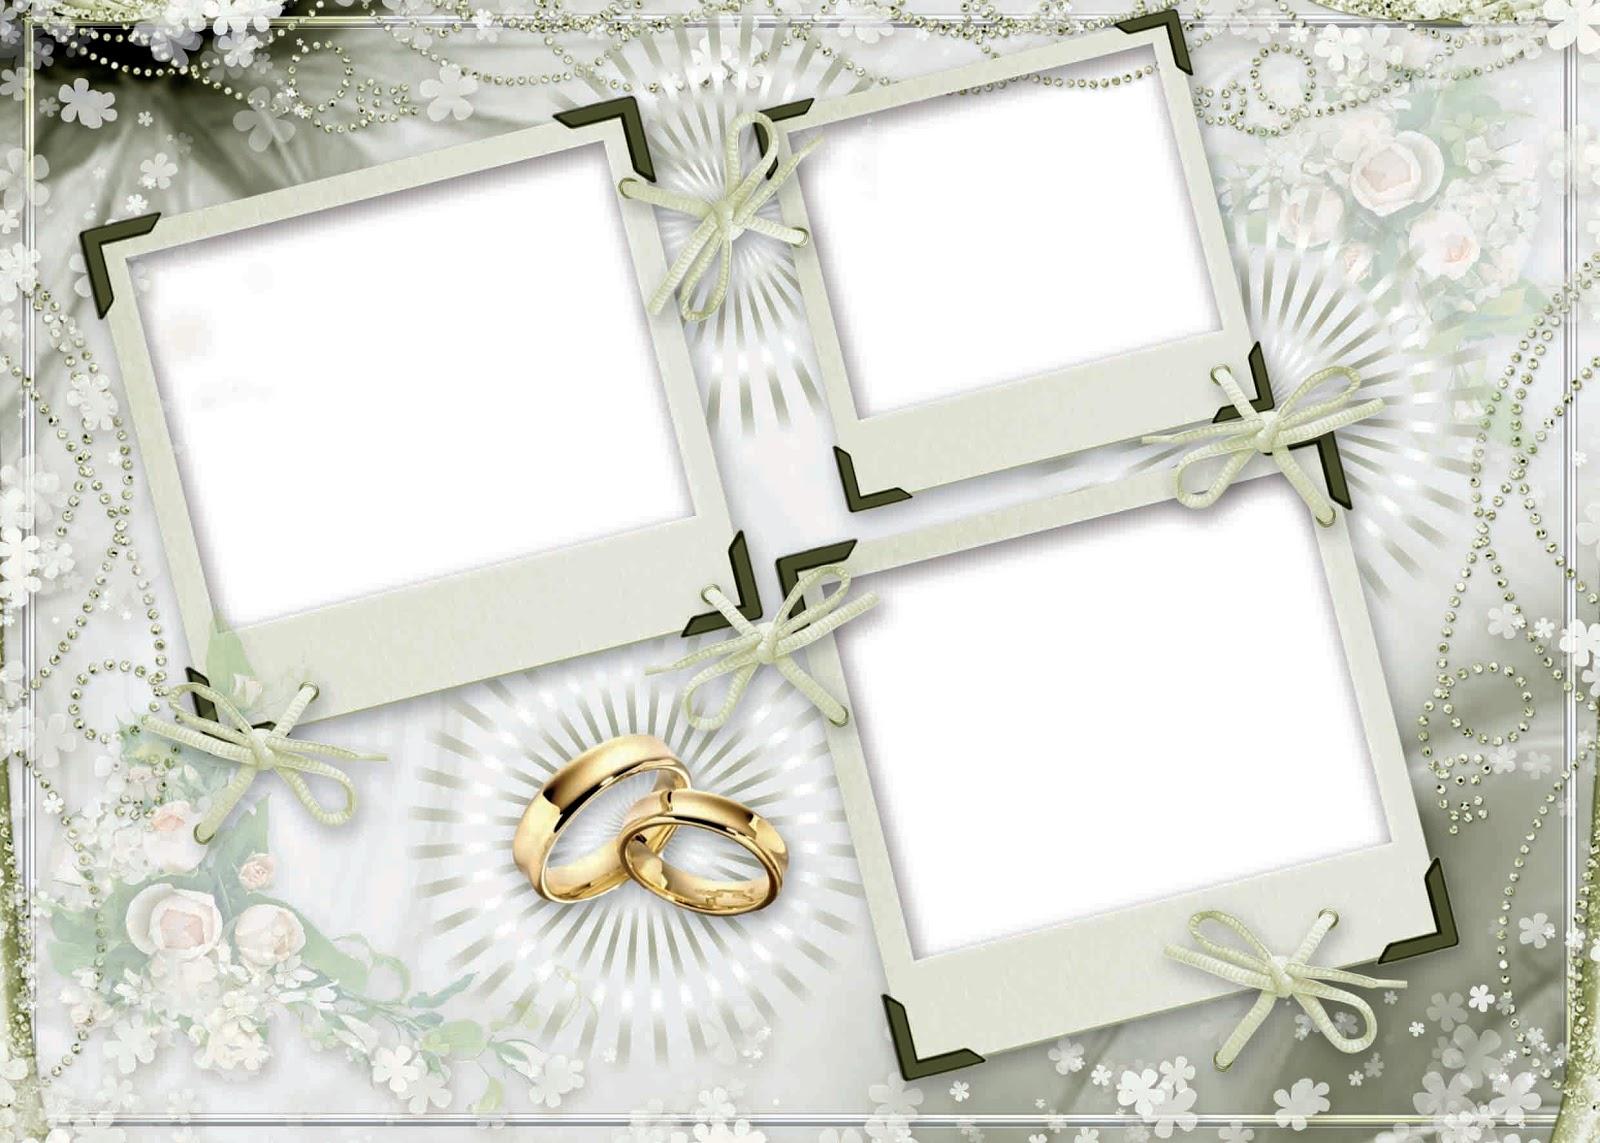 Wedding PNG Psd Free Download - 79962